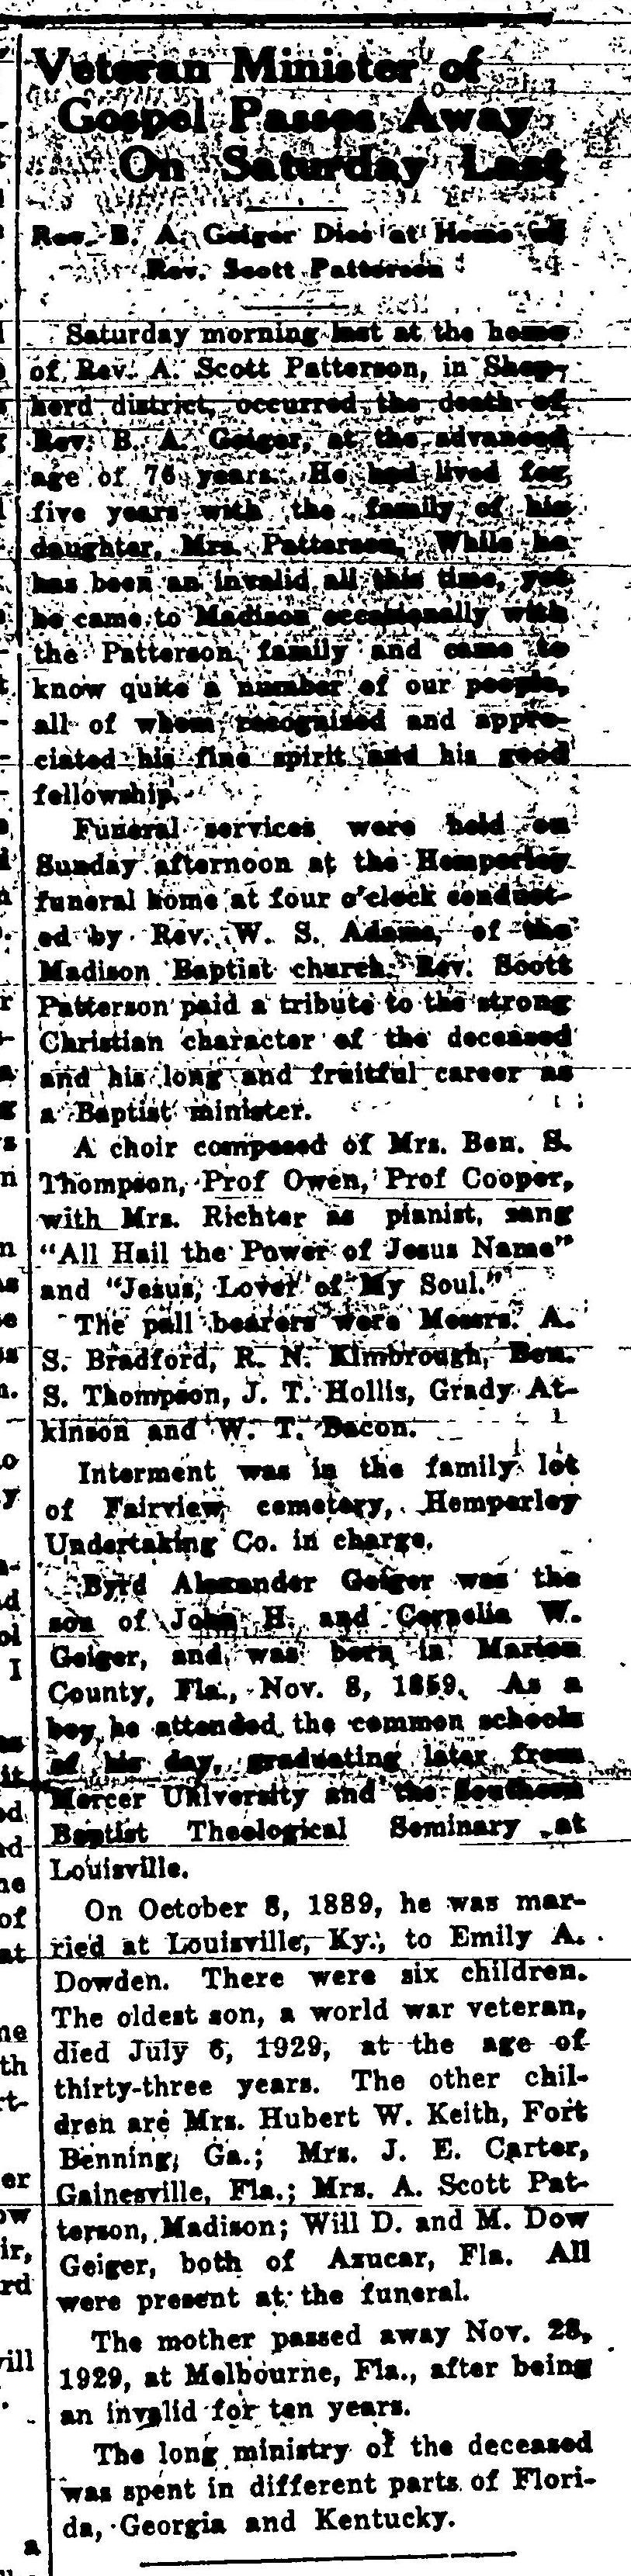 geiger_byrdalexander-1935-obituary.jpeg